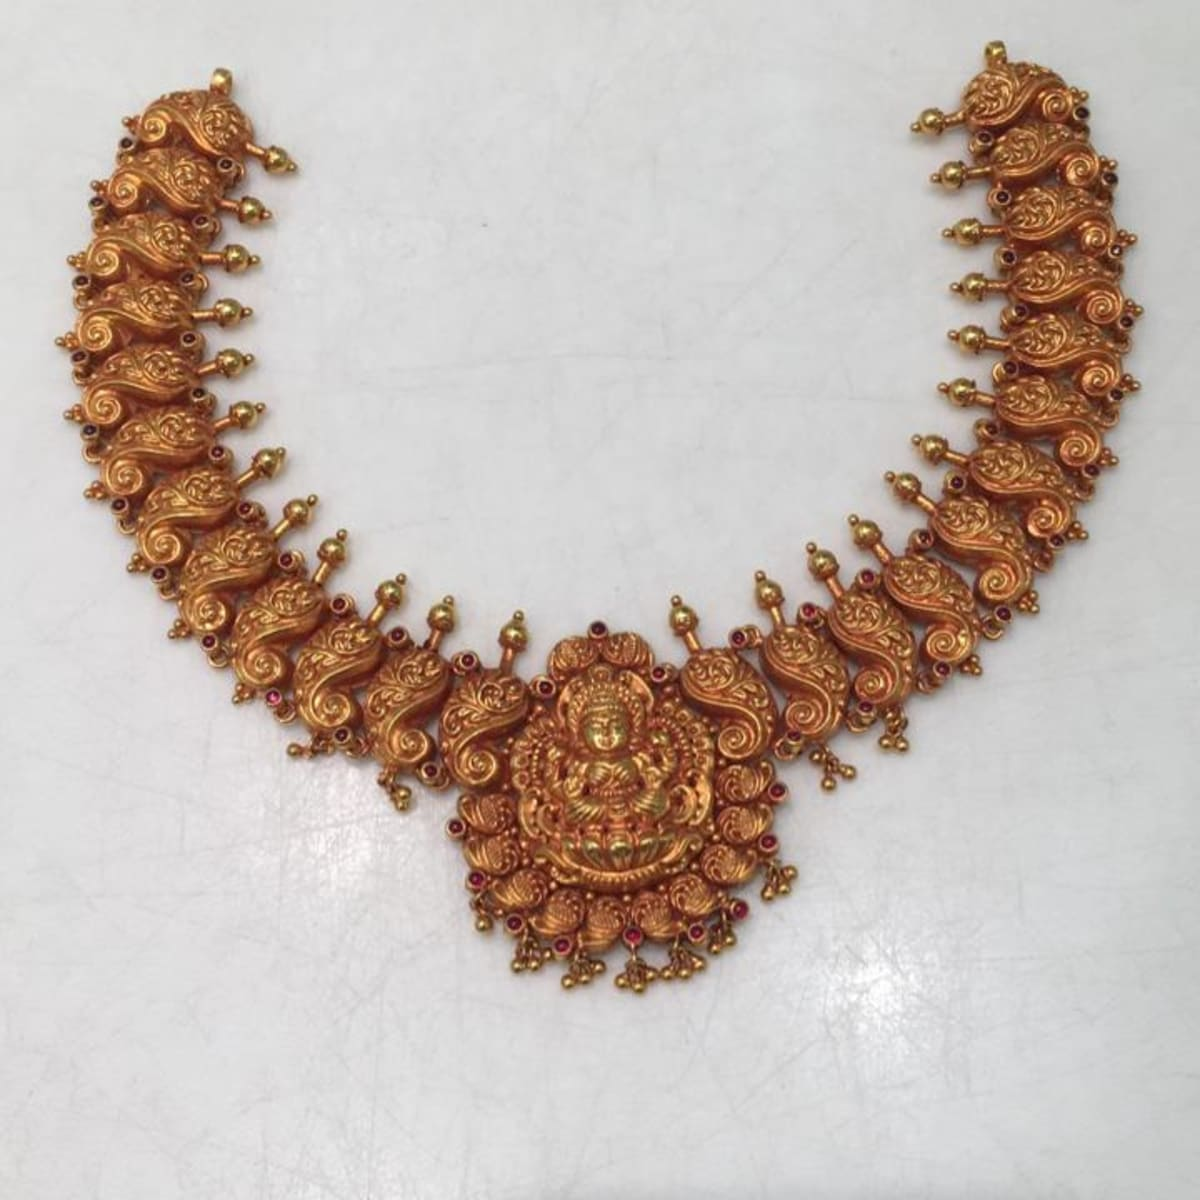 Antique Manga Necklace